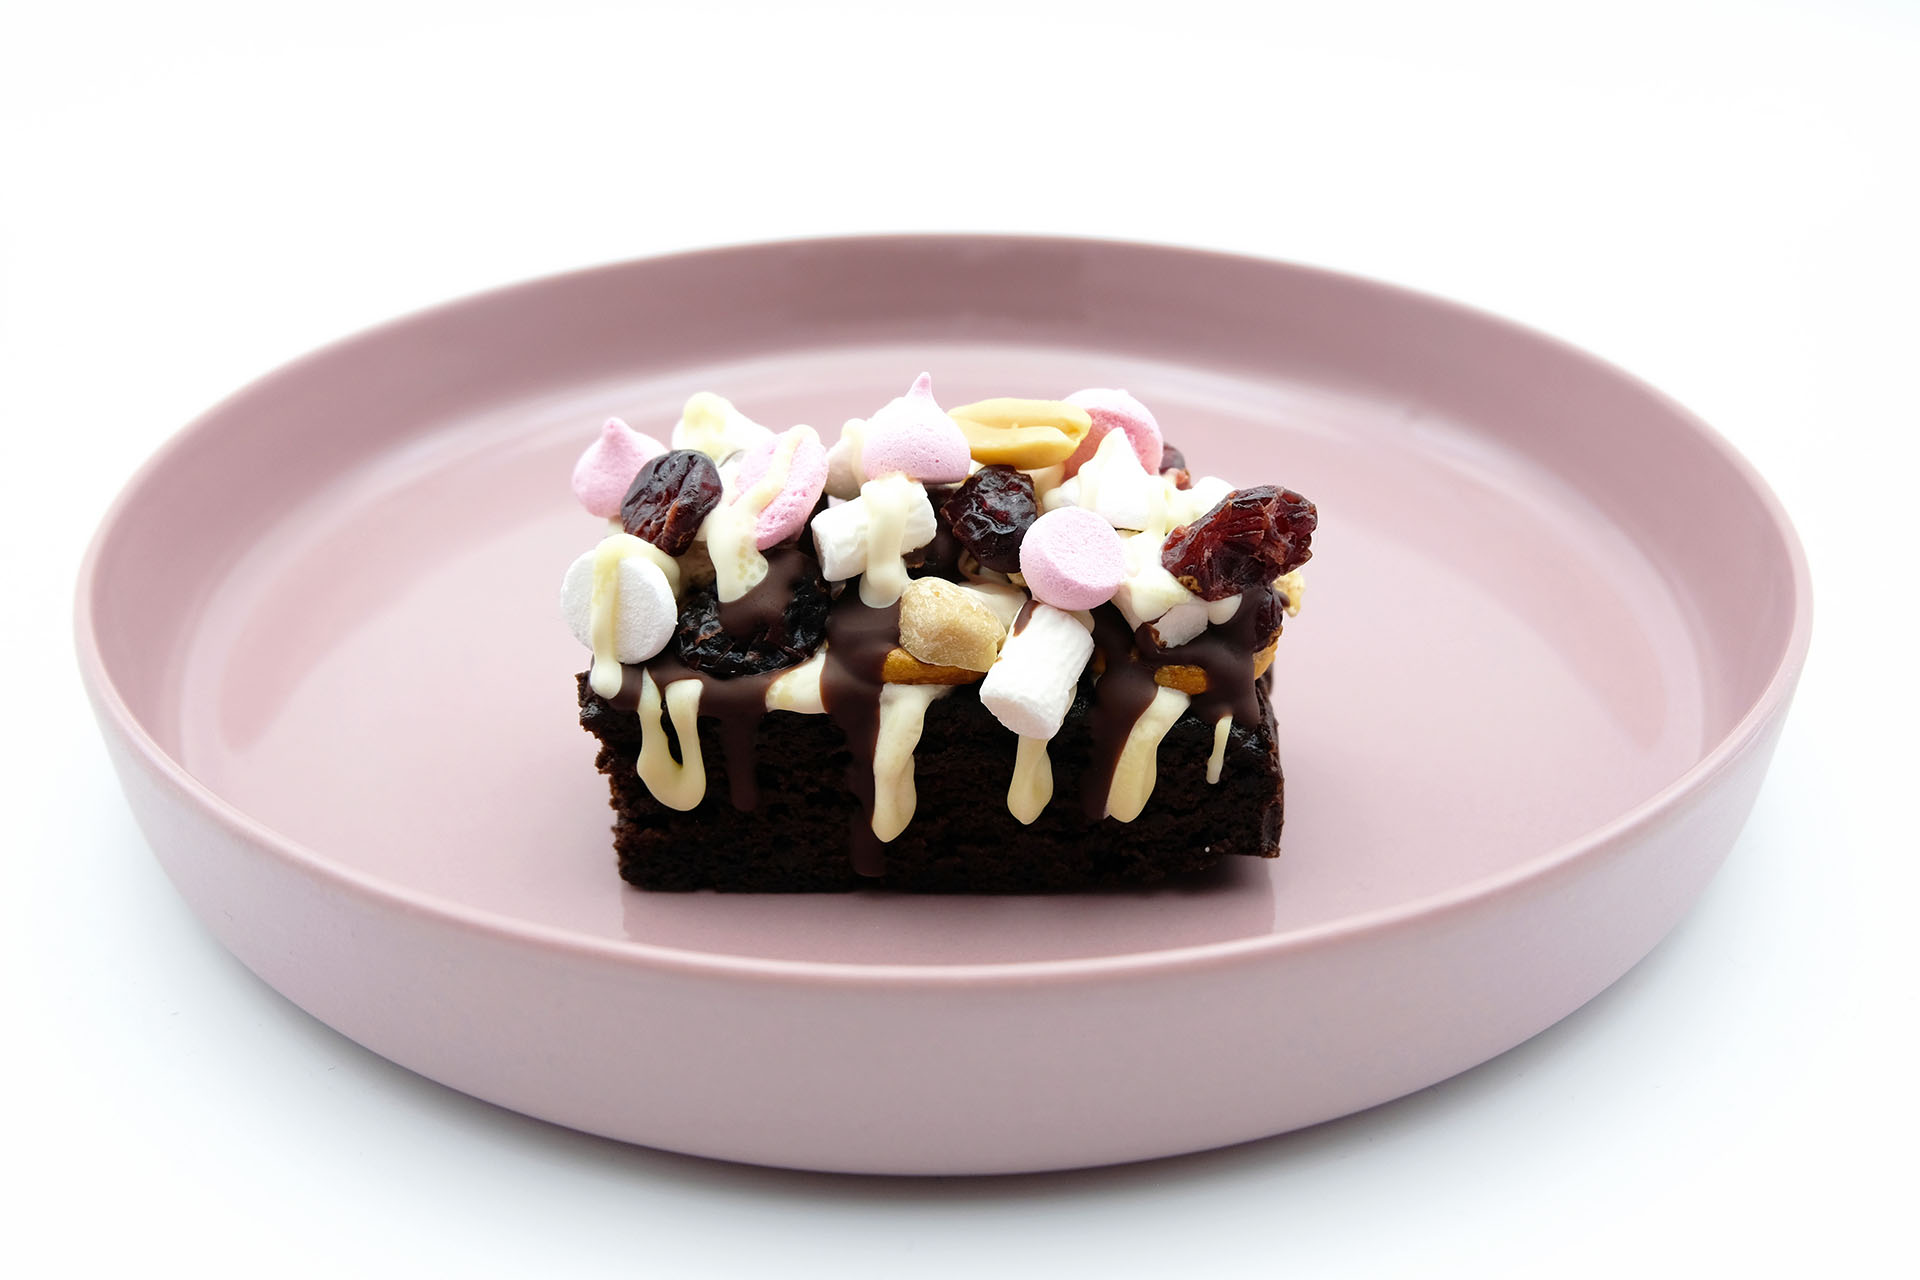 Rezept Rocky Road Brownies Popdish Foodblog, Gerichte, die knallen,